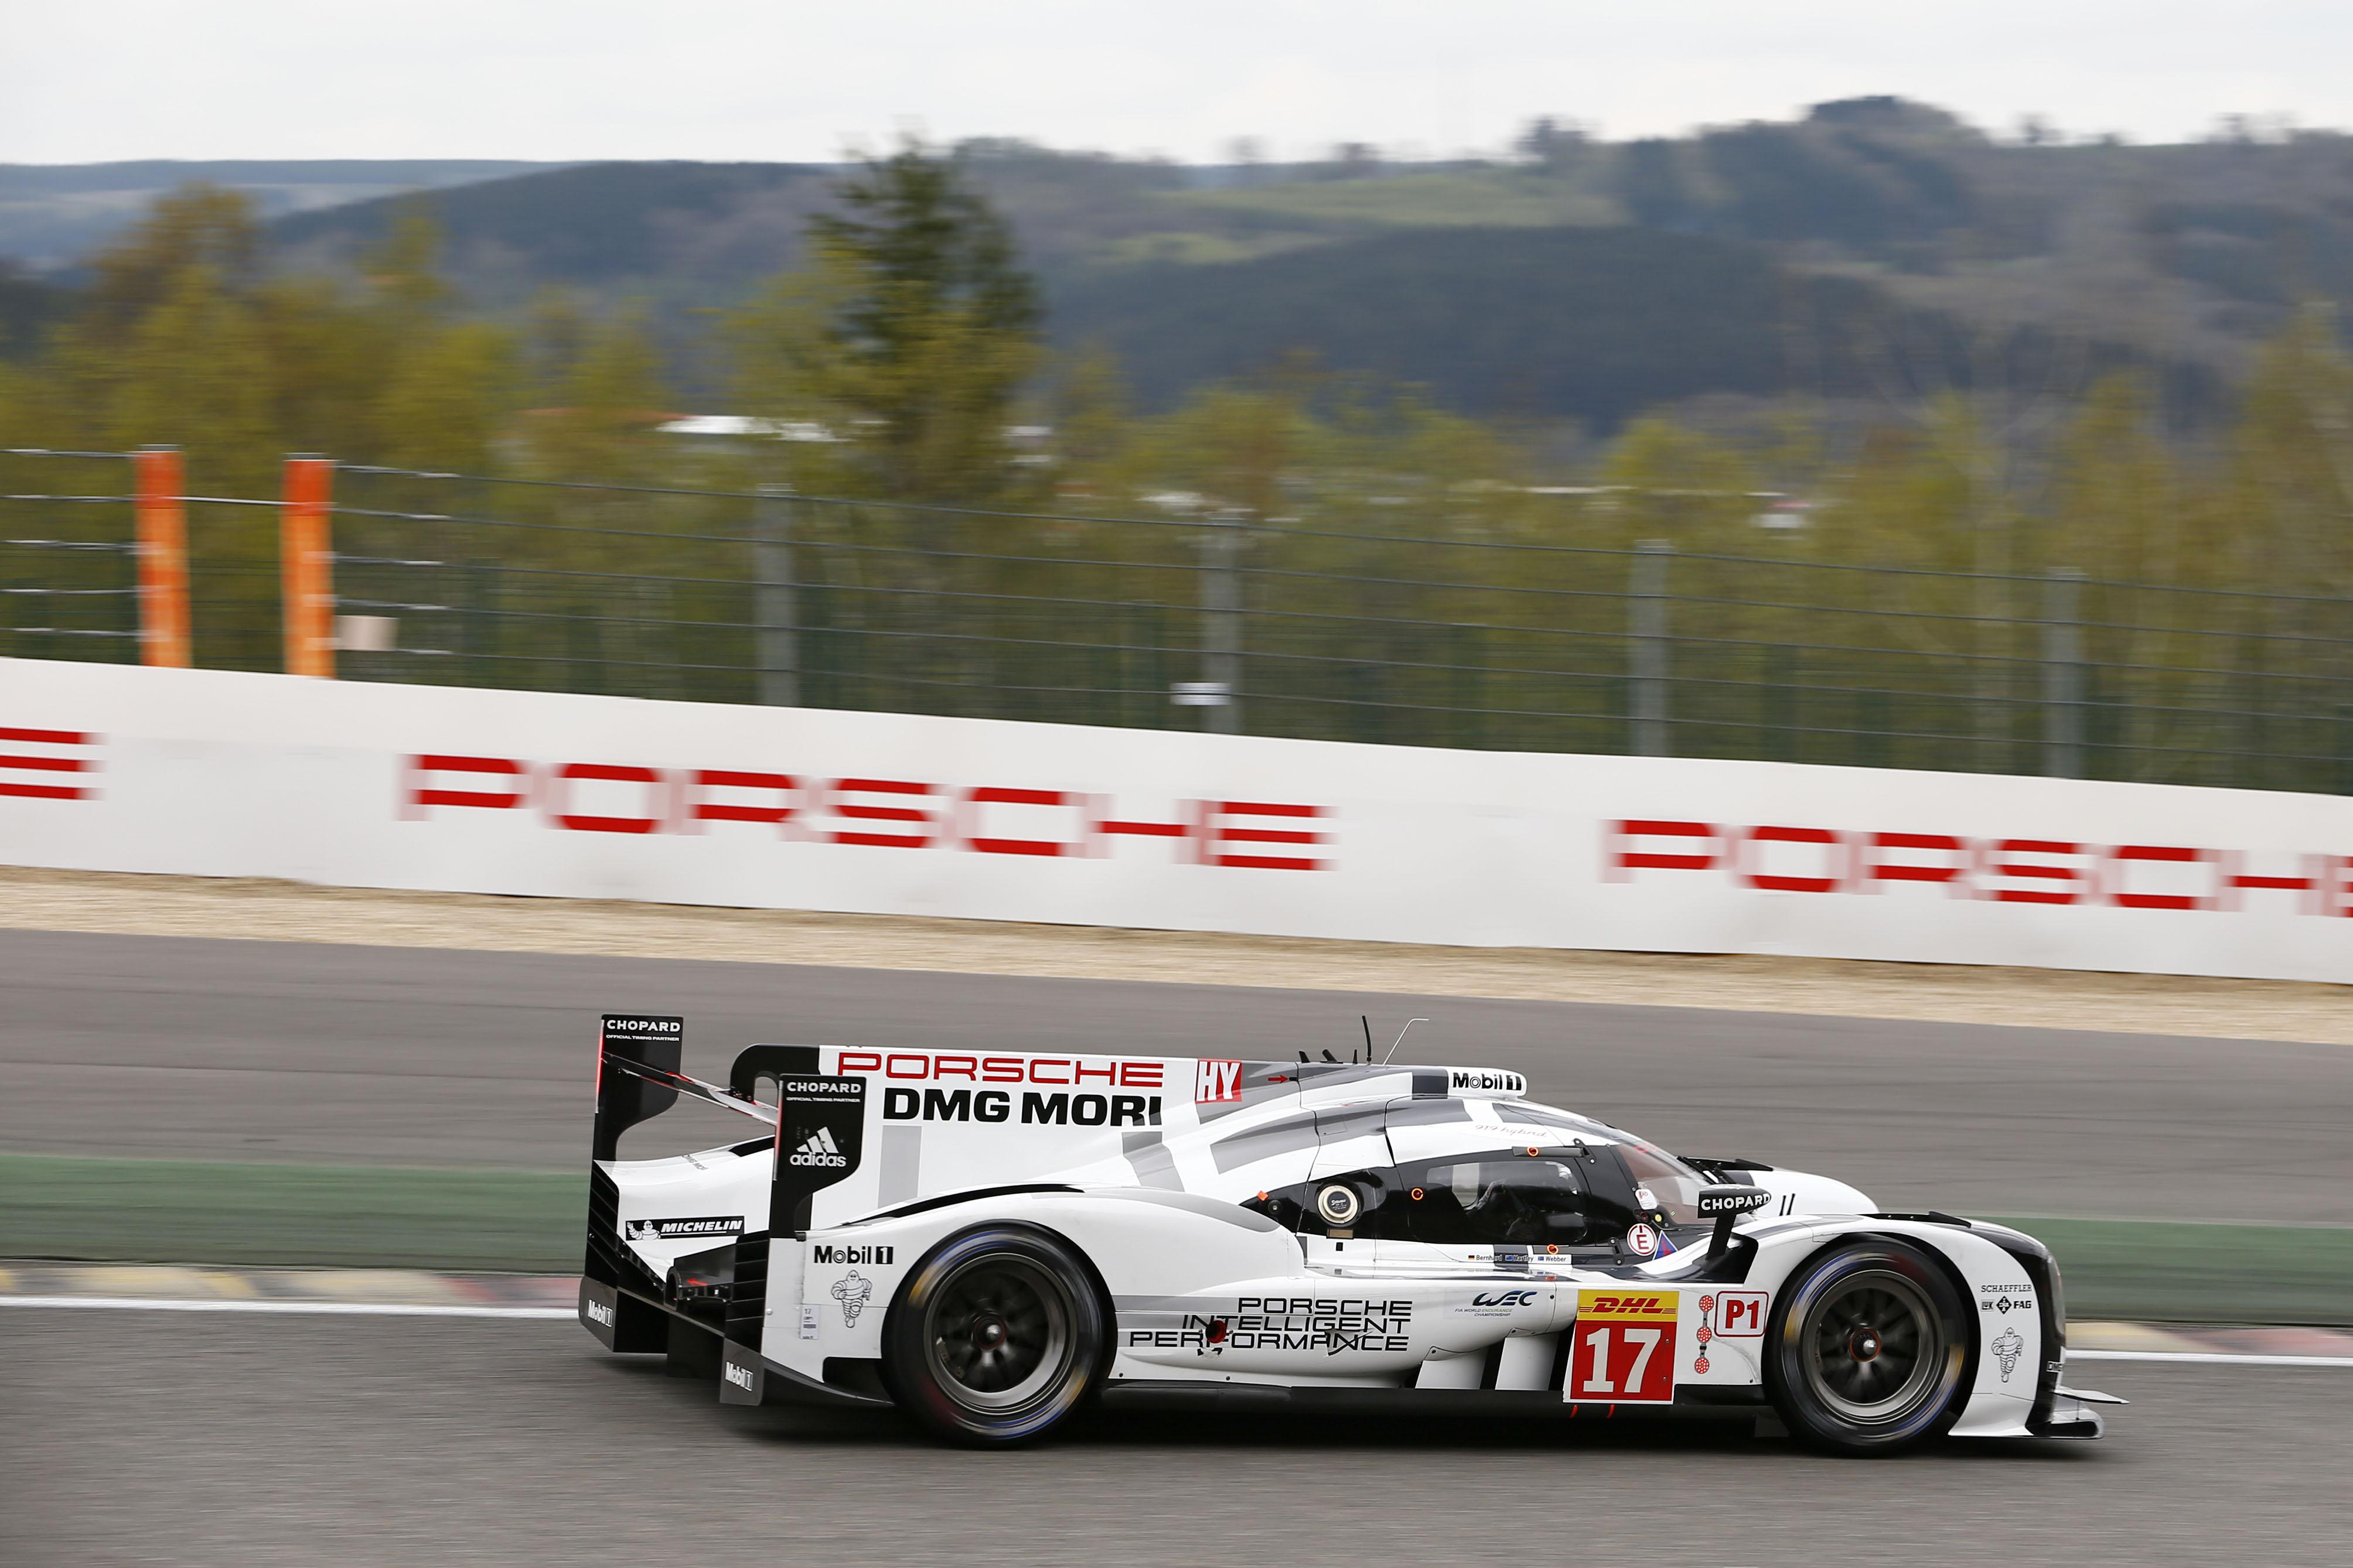 Porsche 919 LMP1-2-3 at Spa Francorchamps - Ferdinand